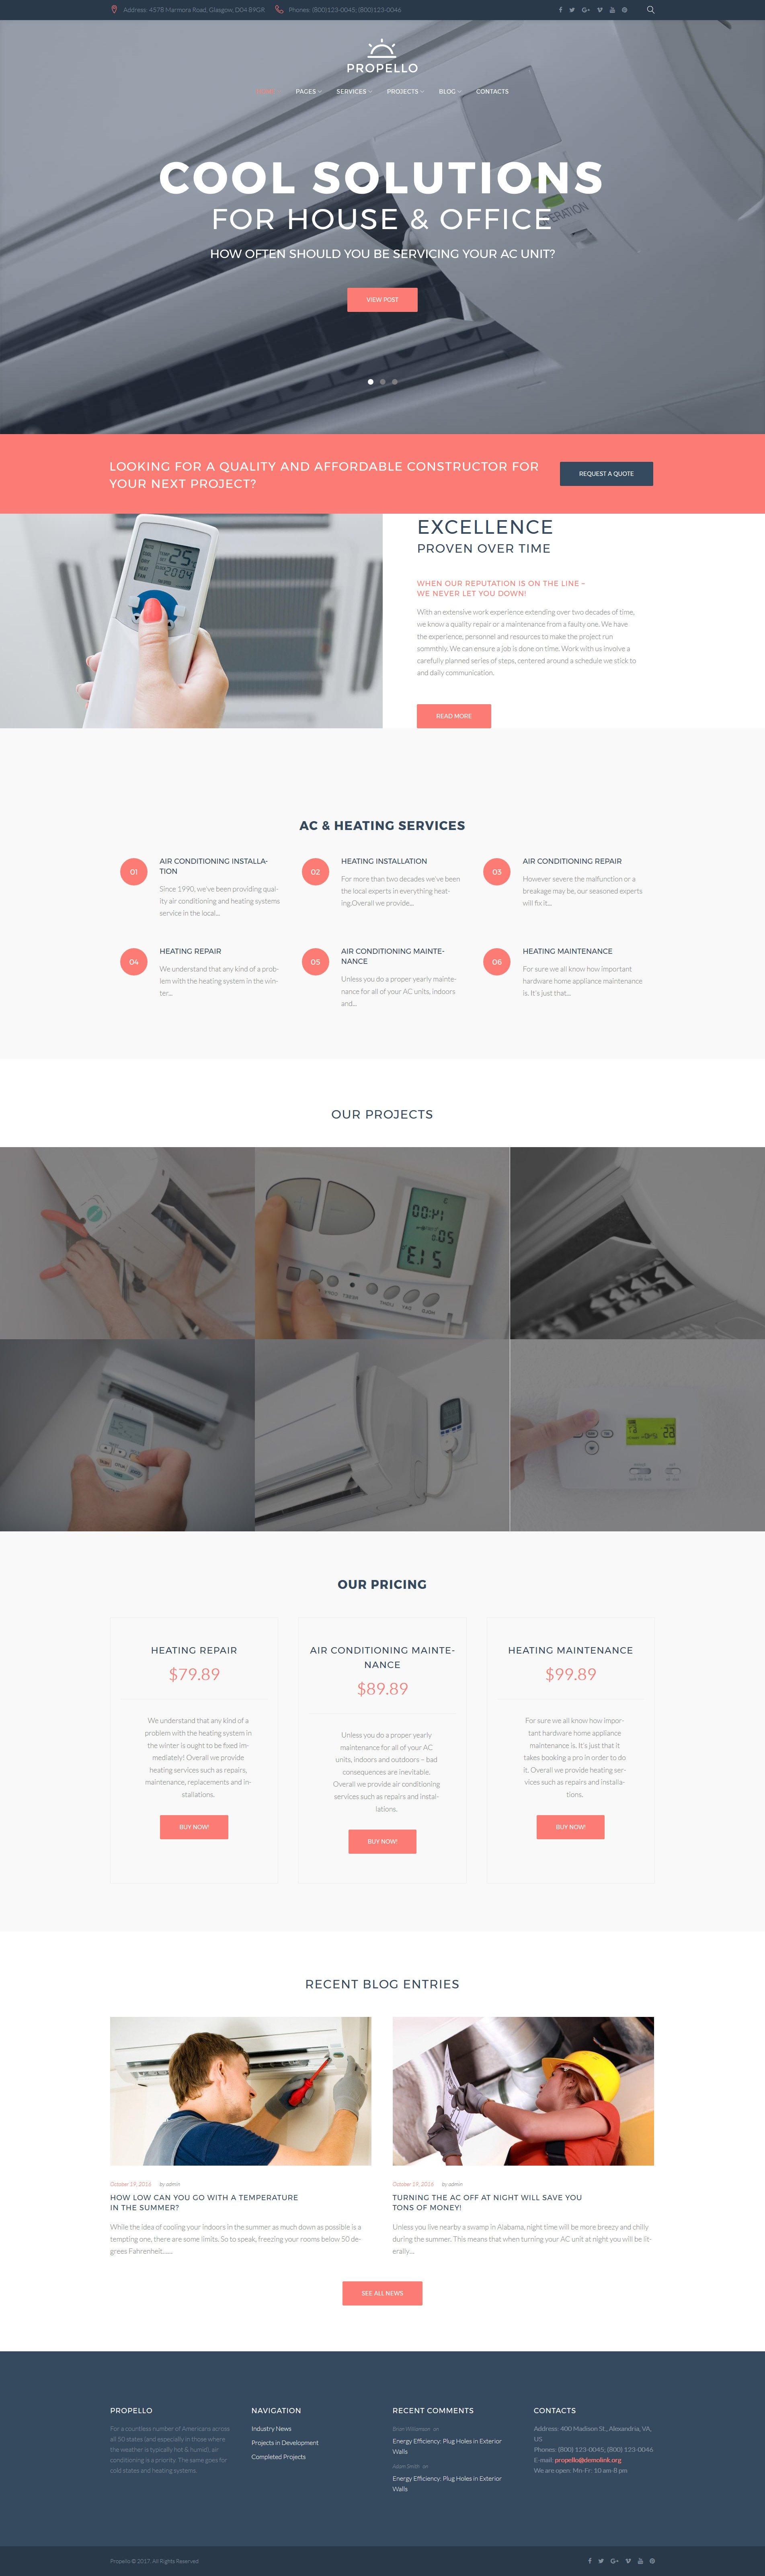 Responsivt Propello - Air Conditioning Maintenance WordPress-tema #62487